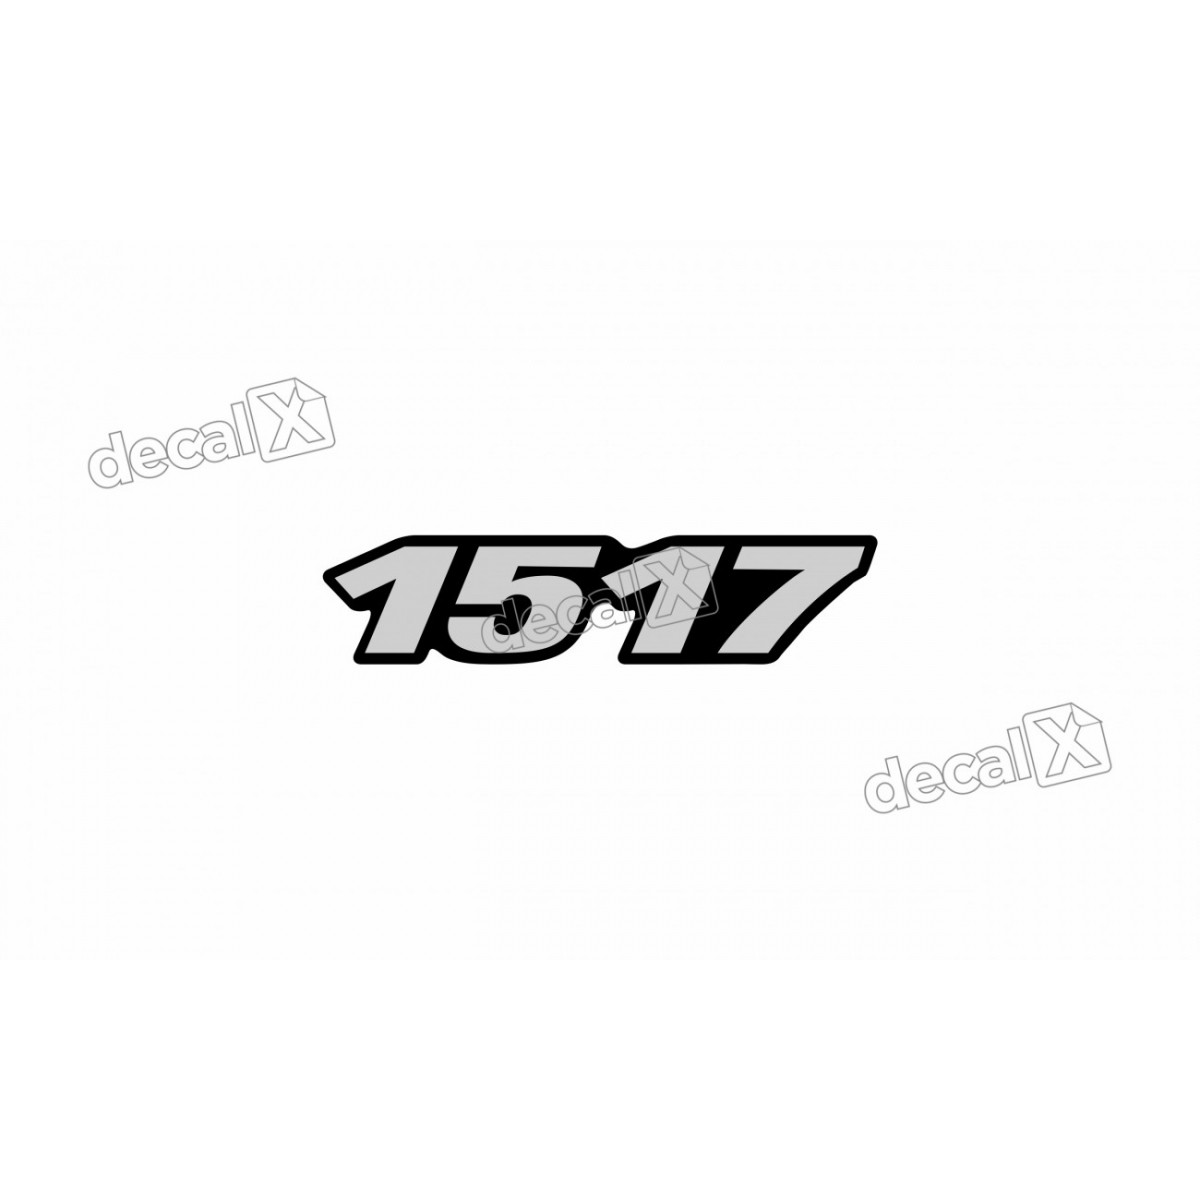 Adesivo Emblema Resinado Mercedes 1517 Cm36 Decalx